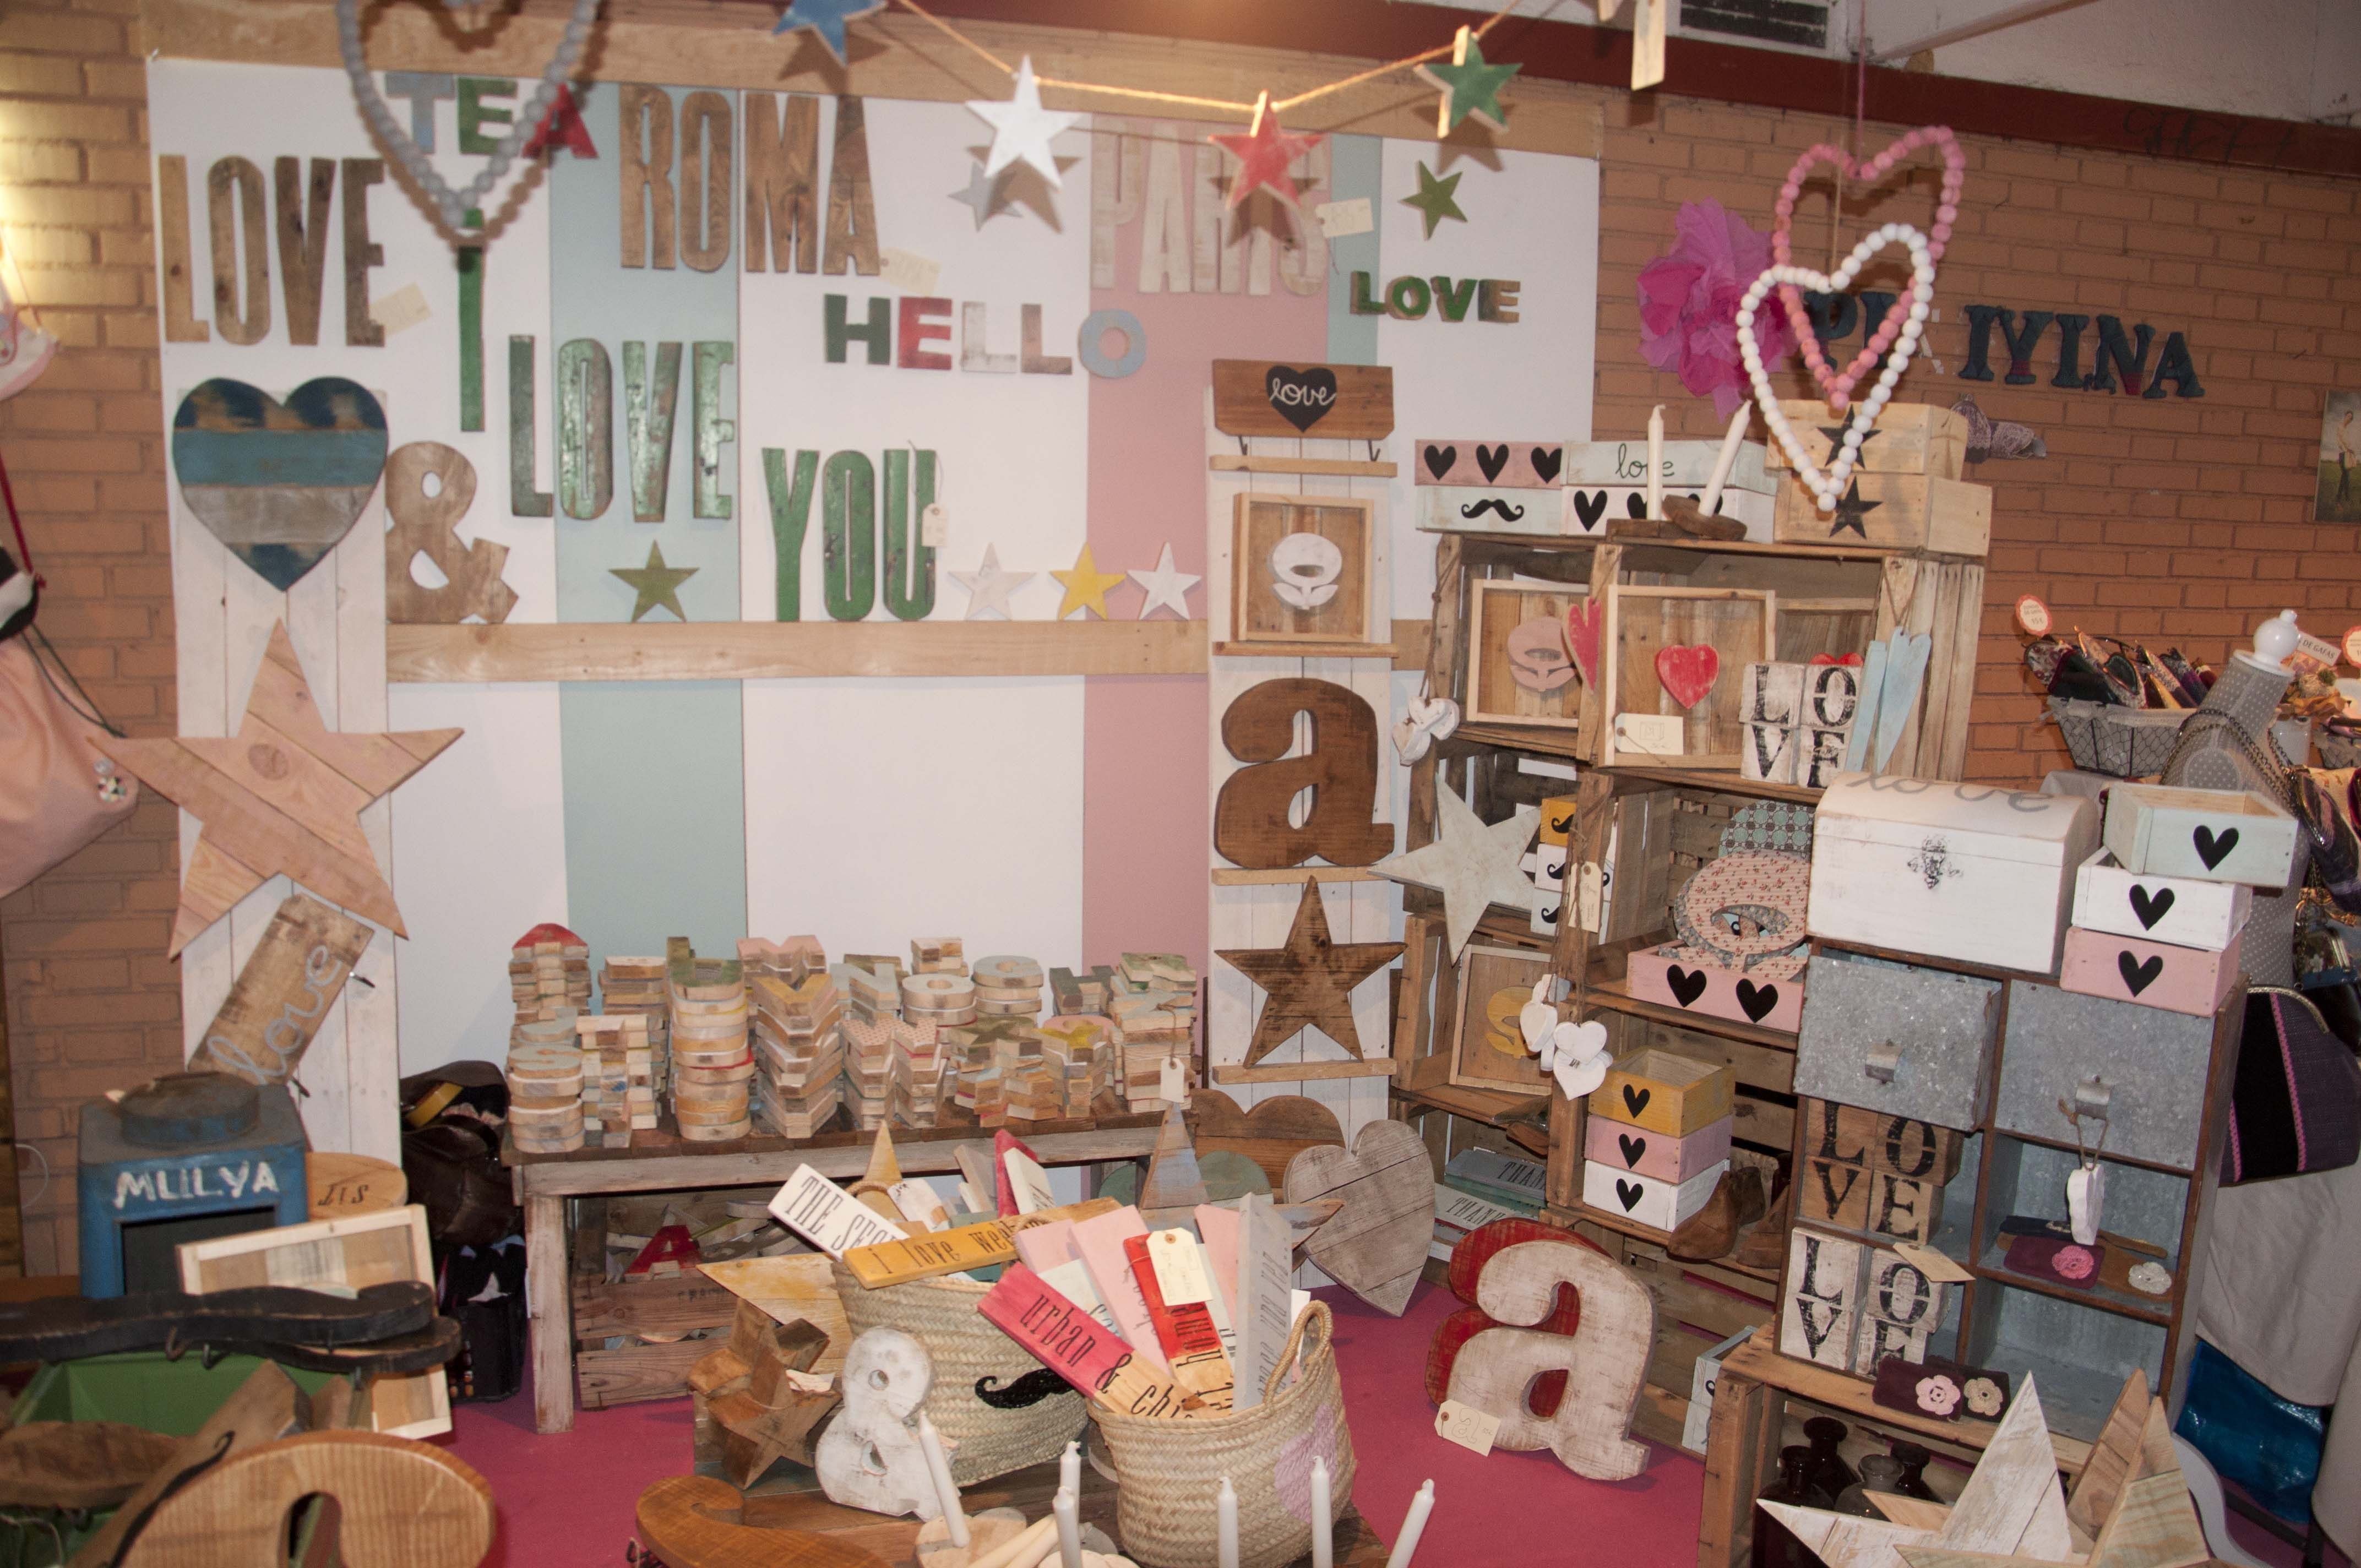 stand de feria artesanal - Buscar con Google | stand | Pinterest ...